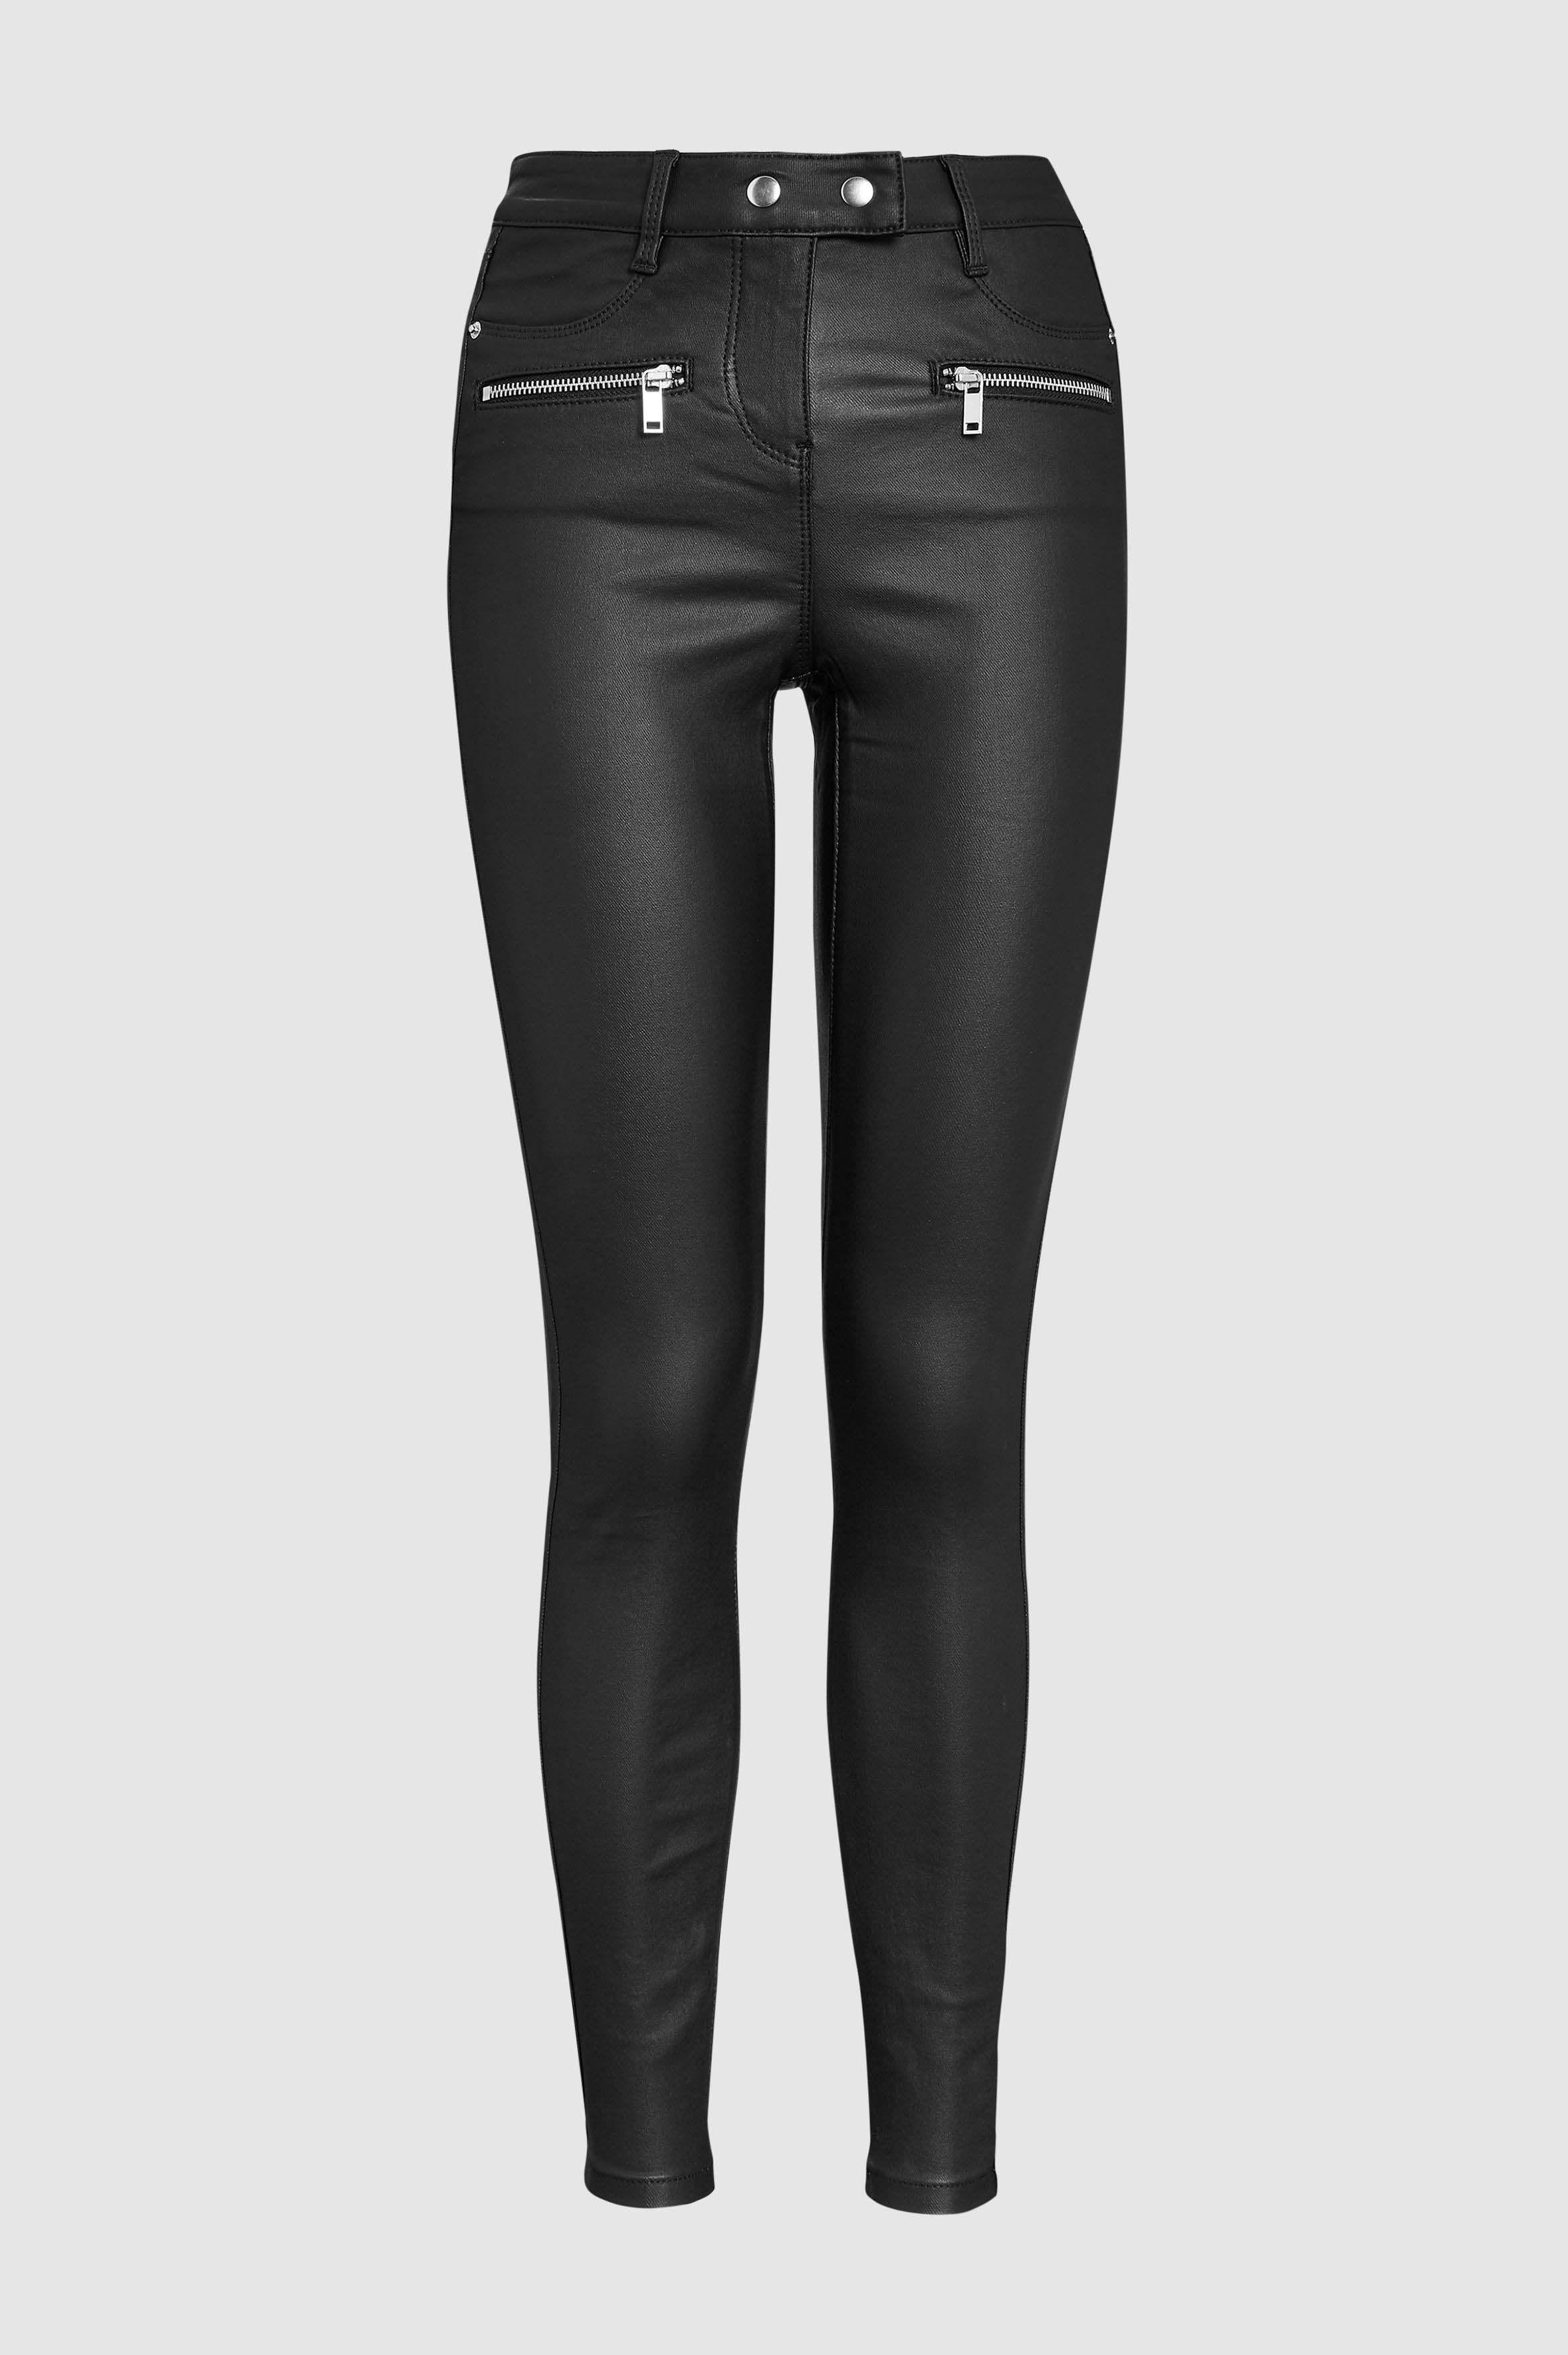 9b4255140be Женские брюки с кулиской из костюмной ткани темно-синие